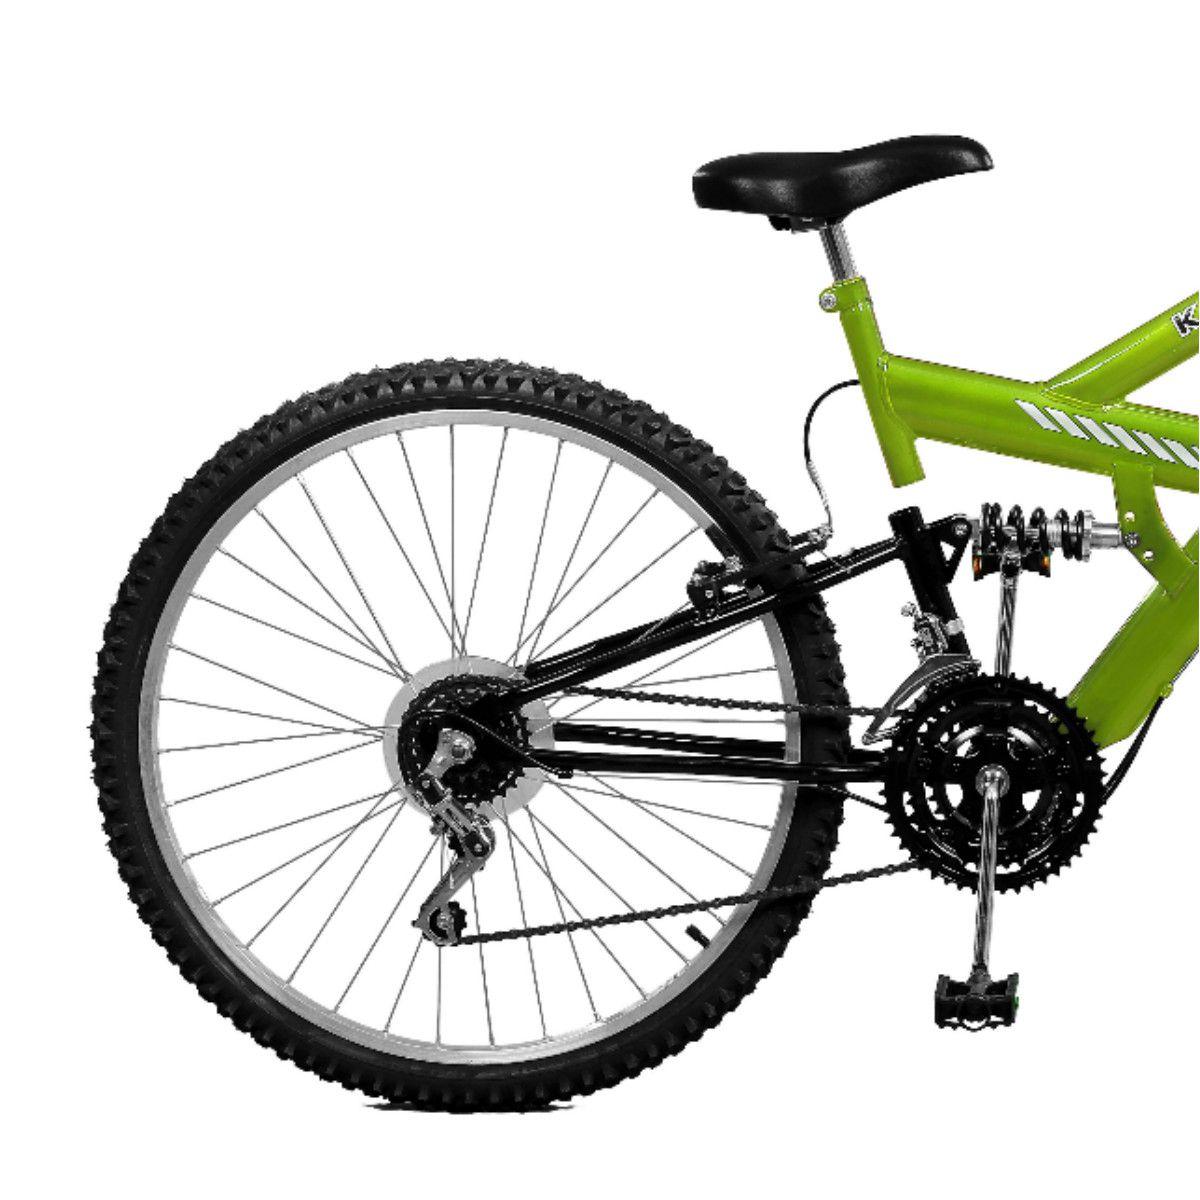 Bicicleta Master Bike Aro 26 Kanguru Style 21 Marchas V-Brake Verde/Preto